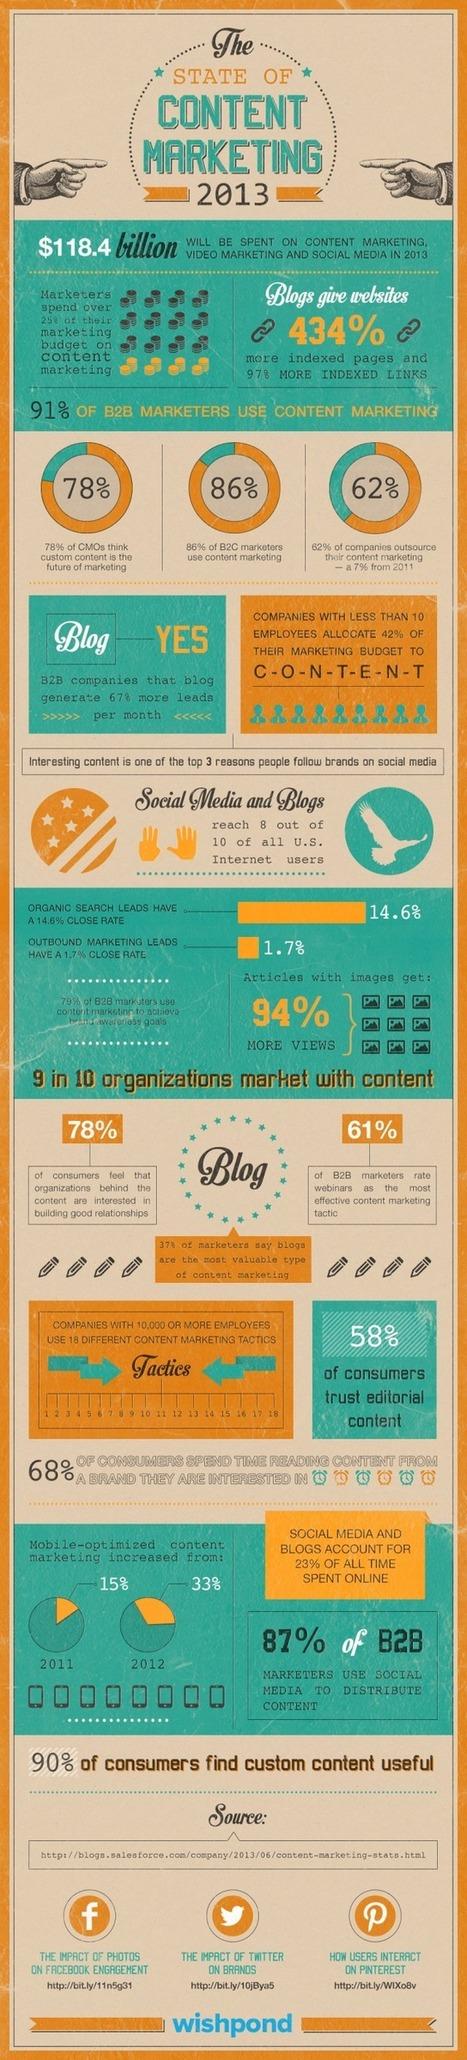 Content Marketing in 2013 - Seafoam Media   social media market research   Scoop.it